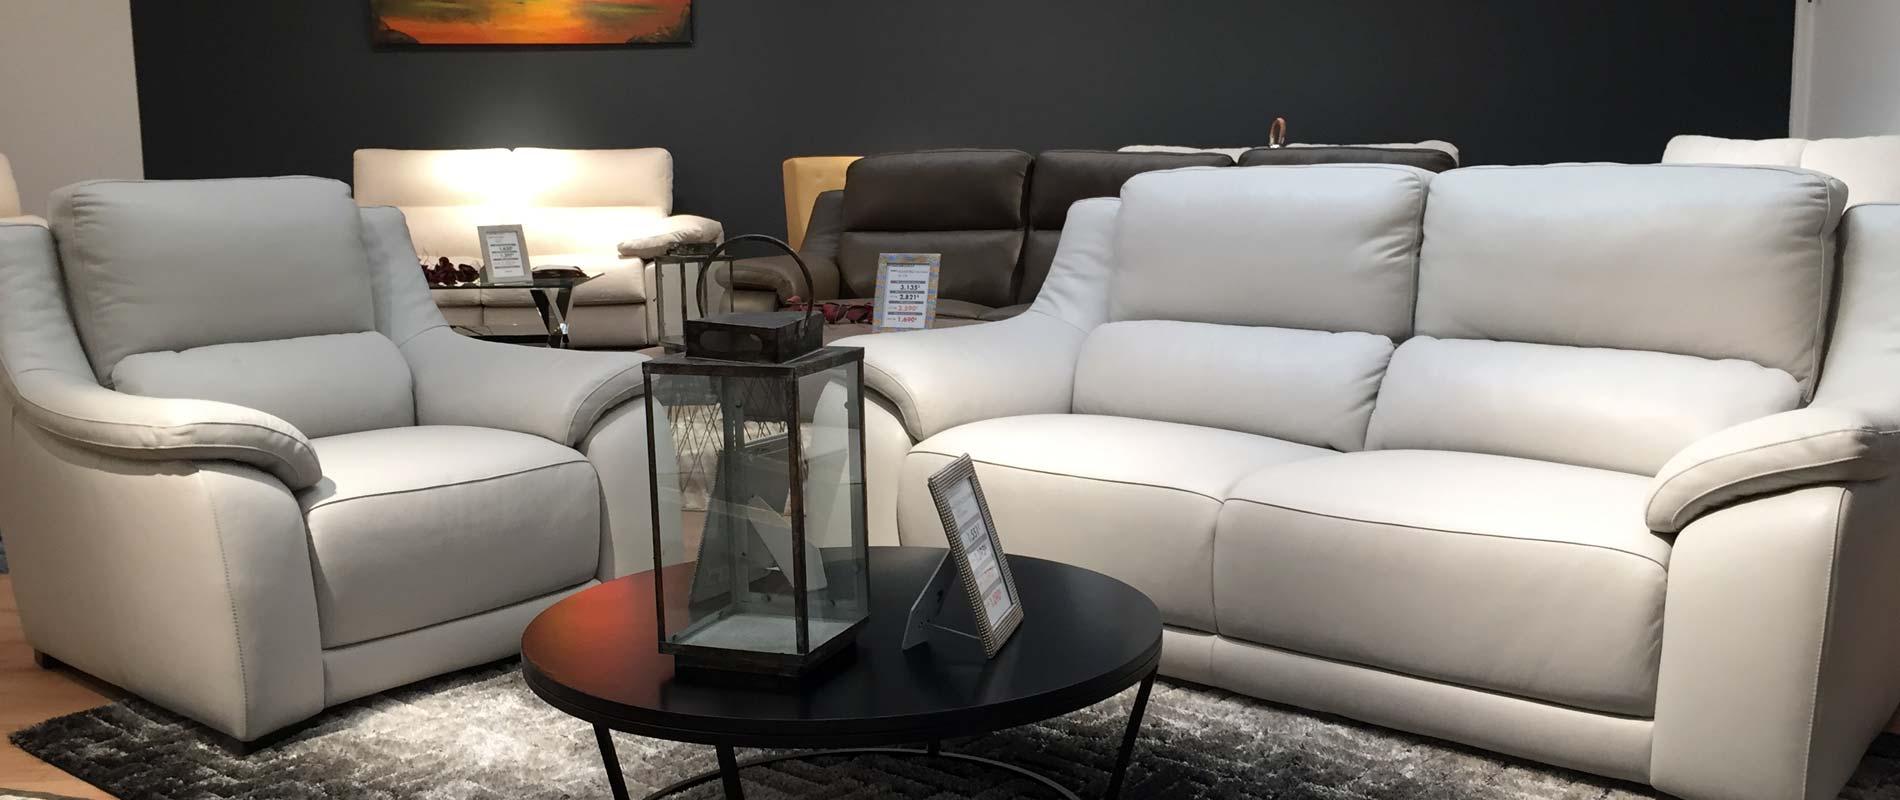 tiendas sofas madrid sur home decorators sofa tienda outlet sofás európolis baratos